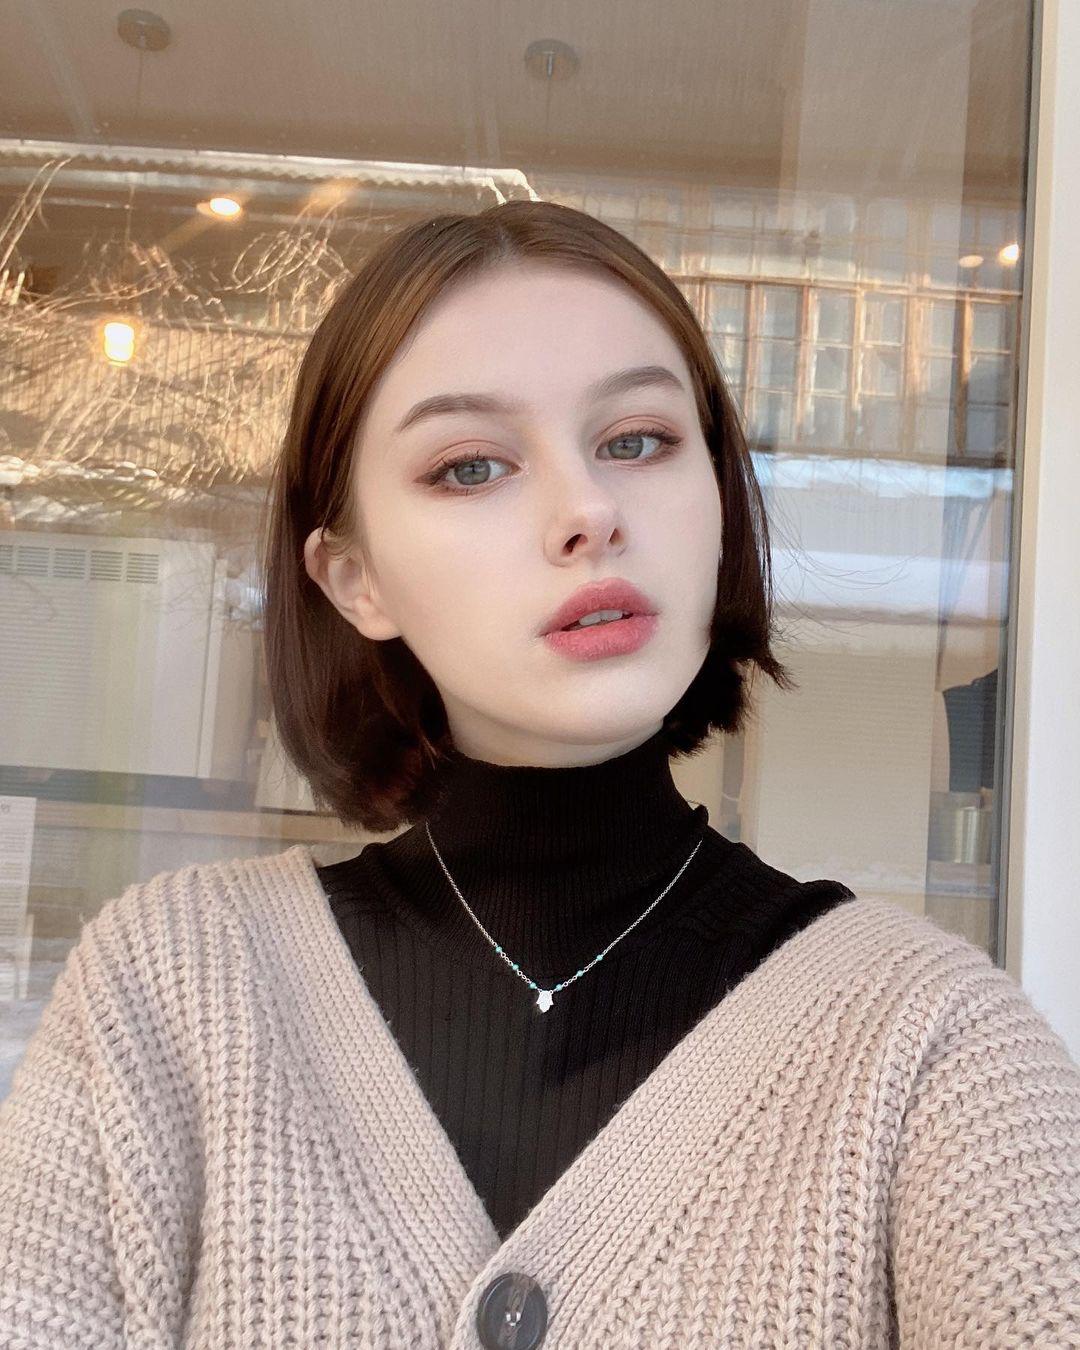 Darina-Brodskaya-Wallpapers-Insta-Fit-Bio-8